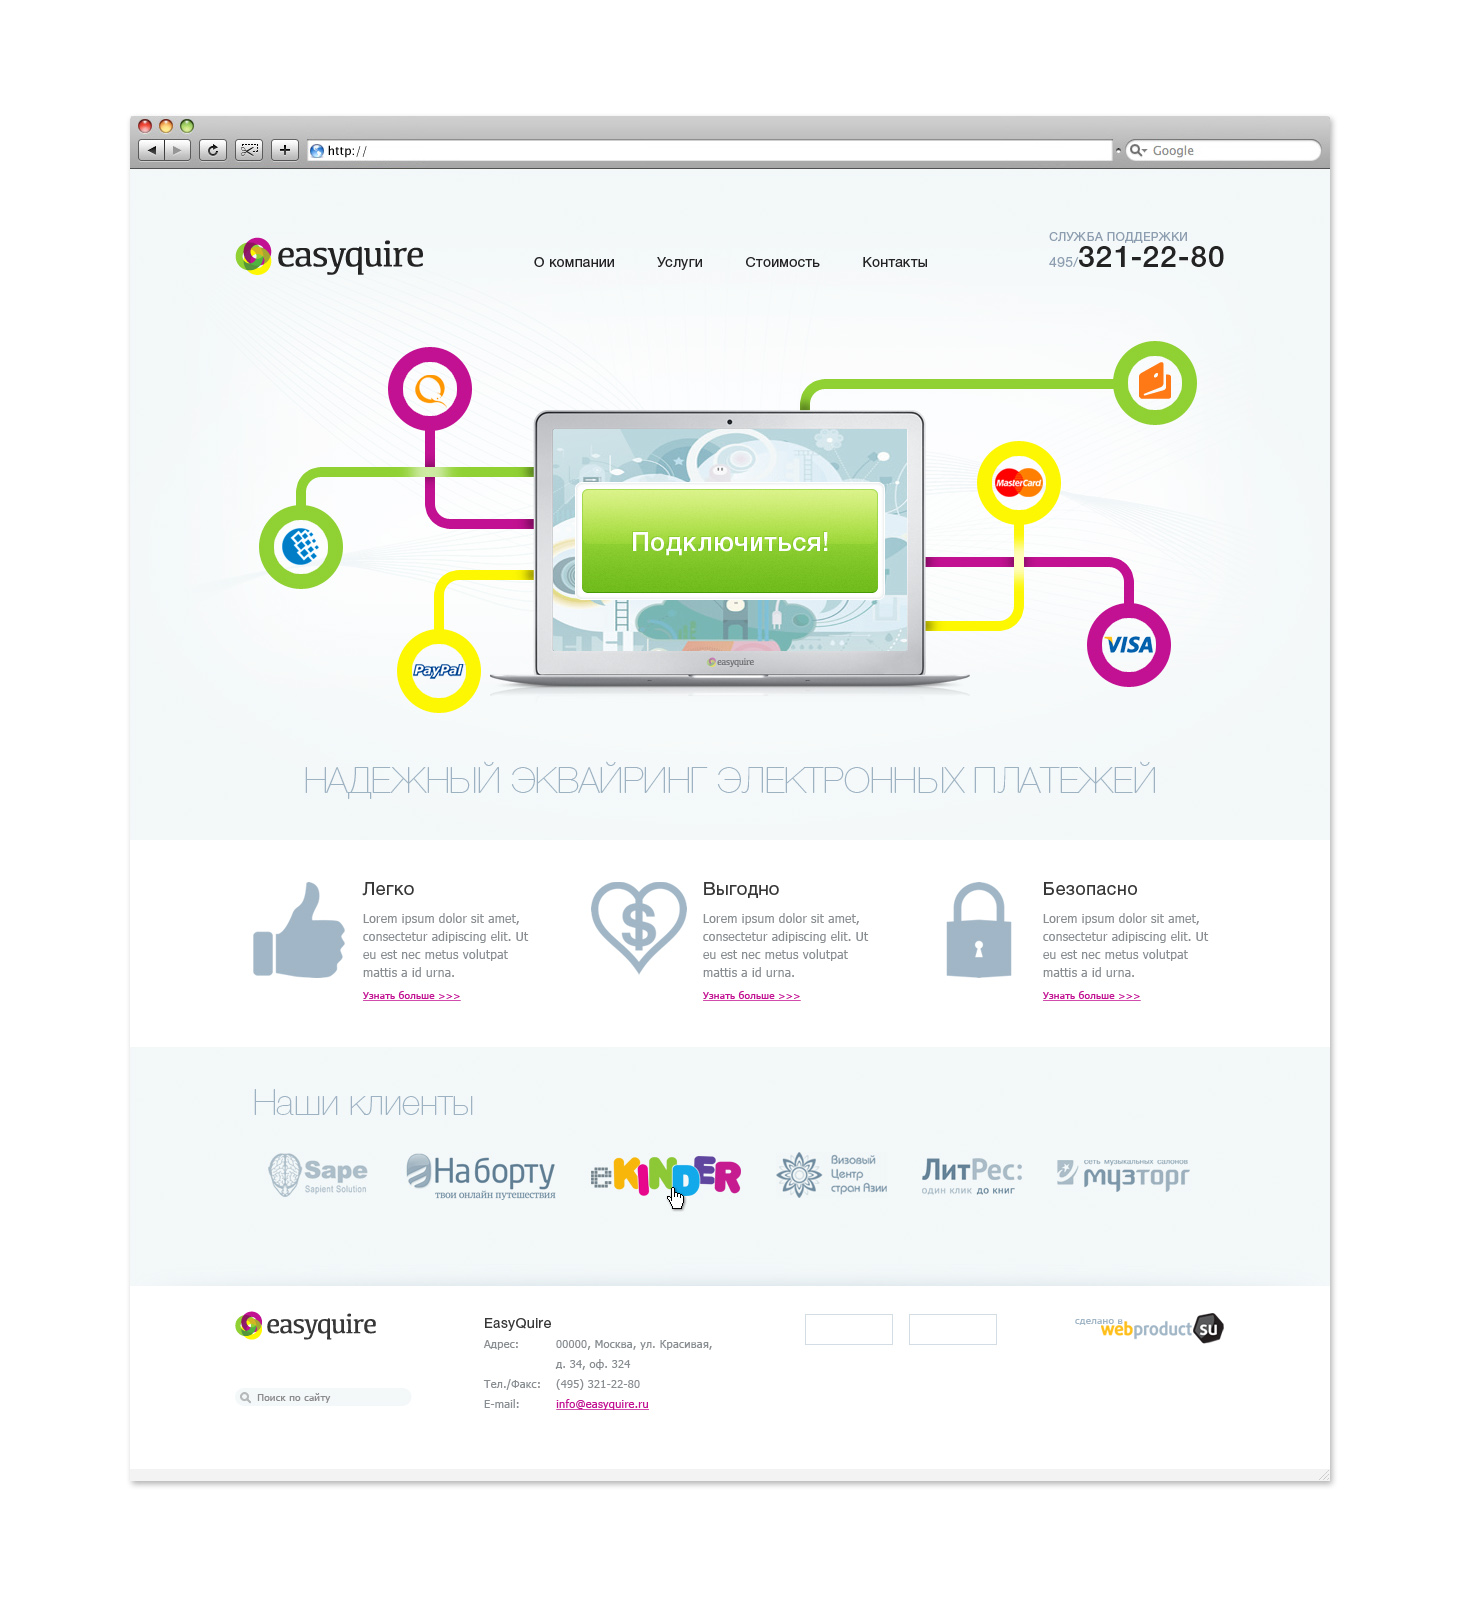 Дизайн сайта easyquire